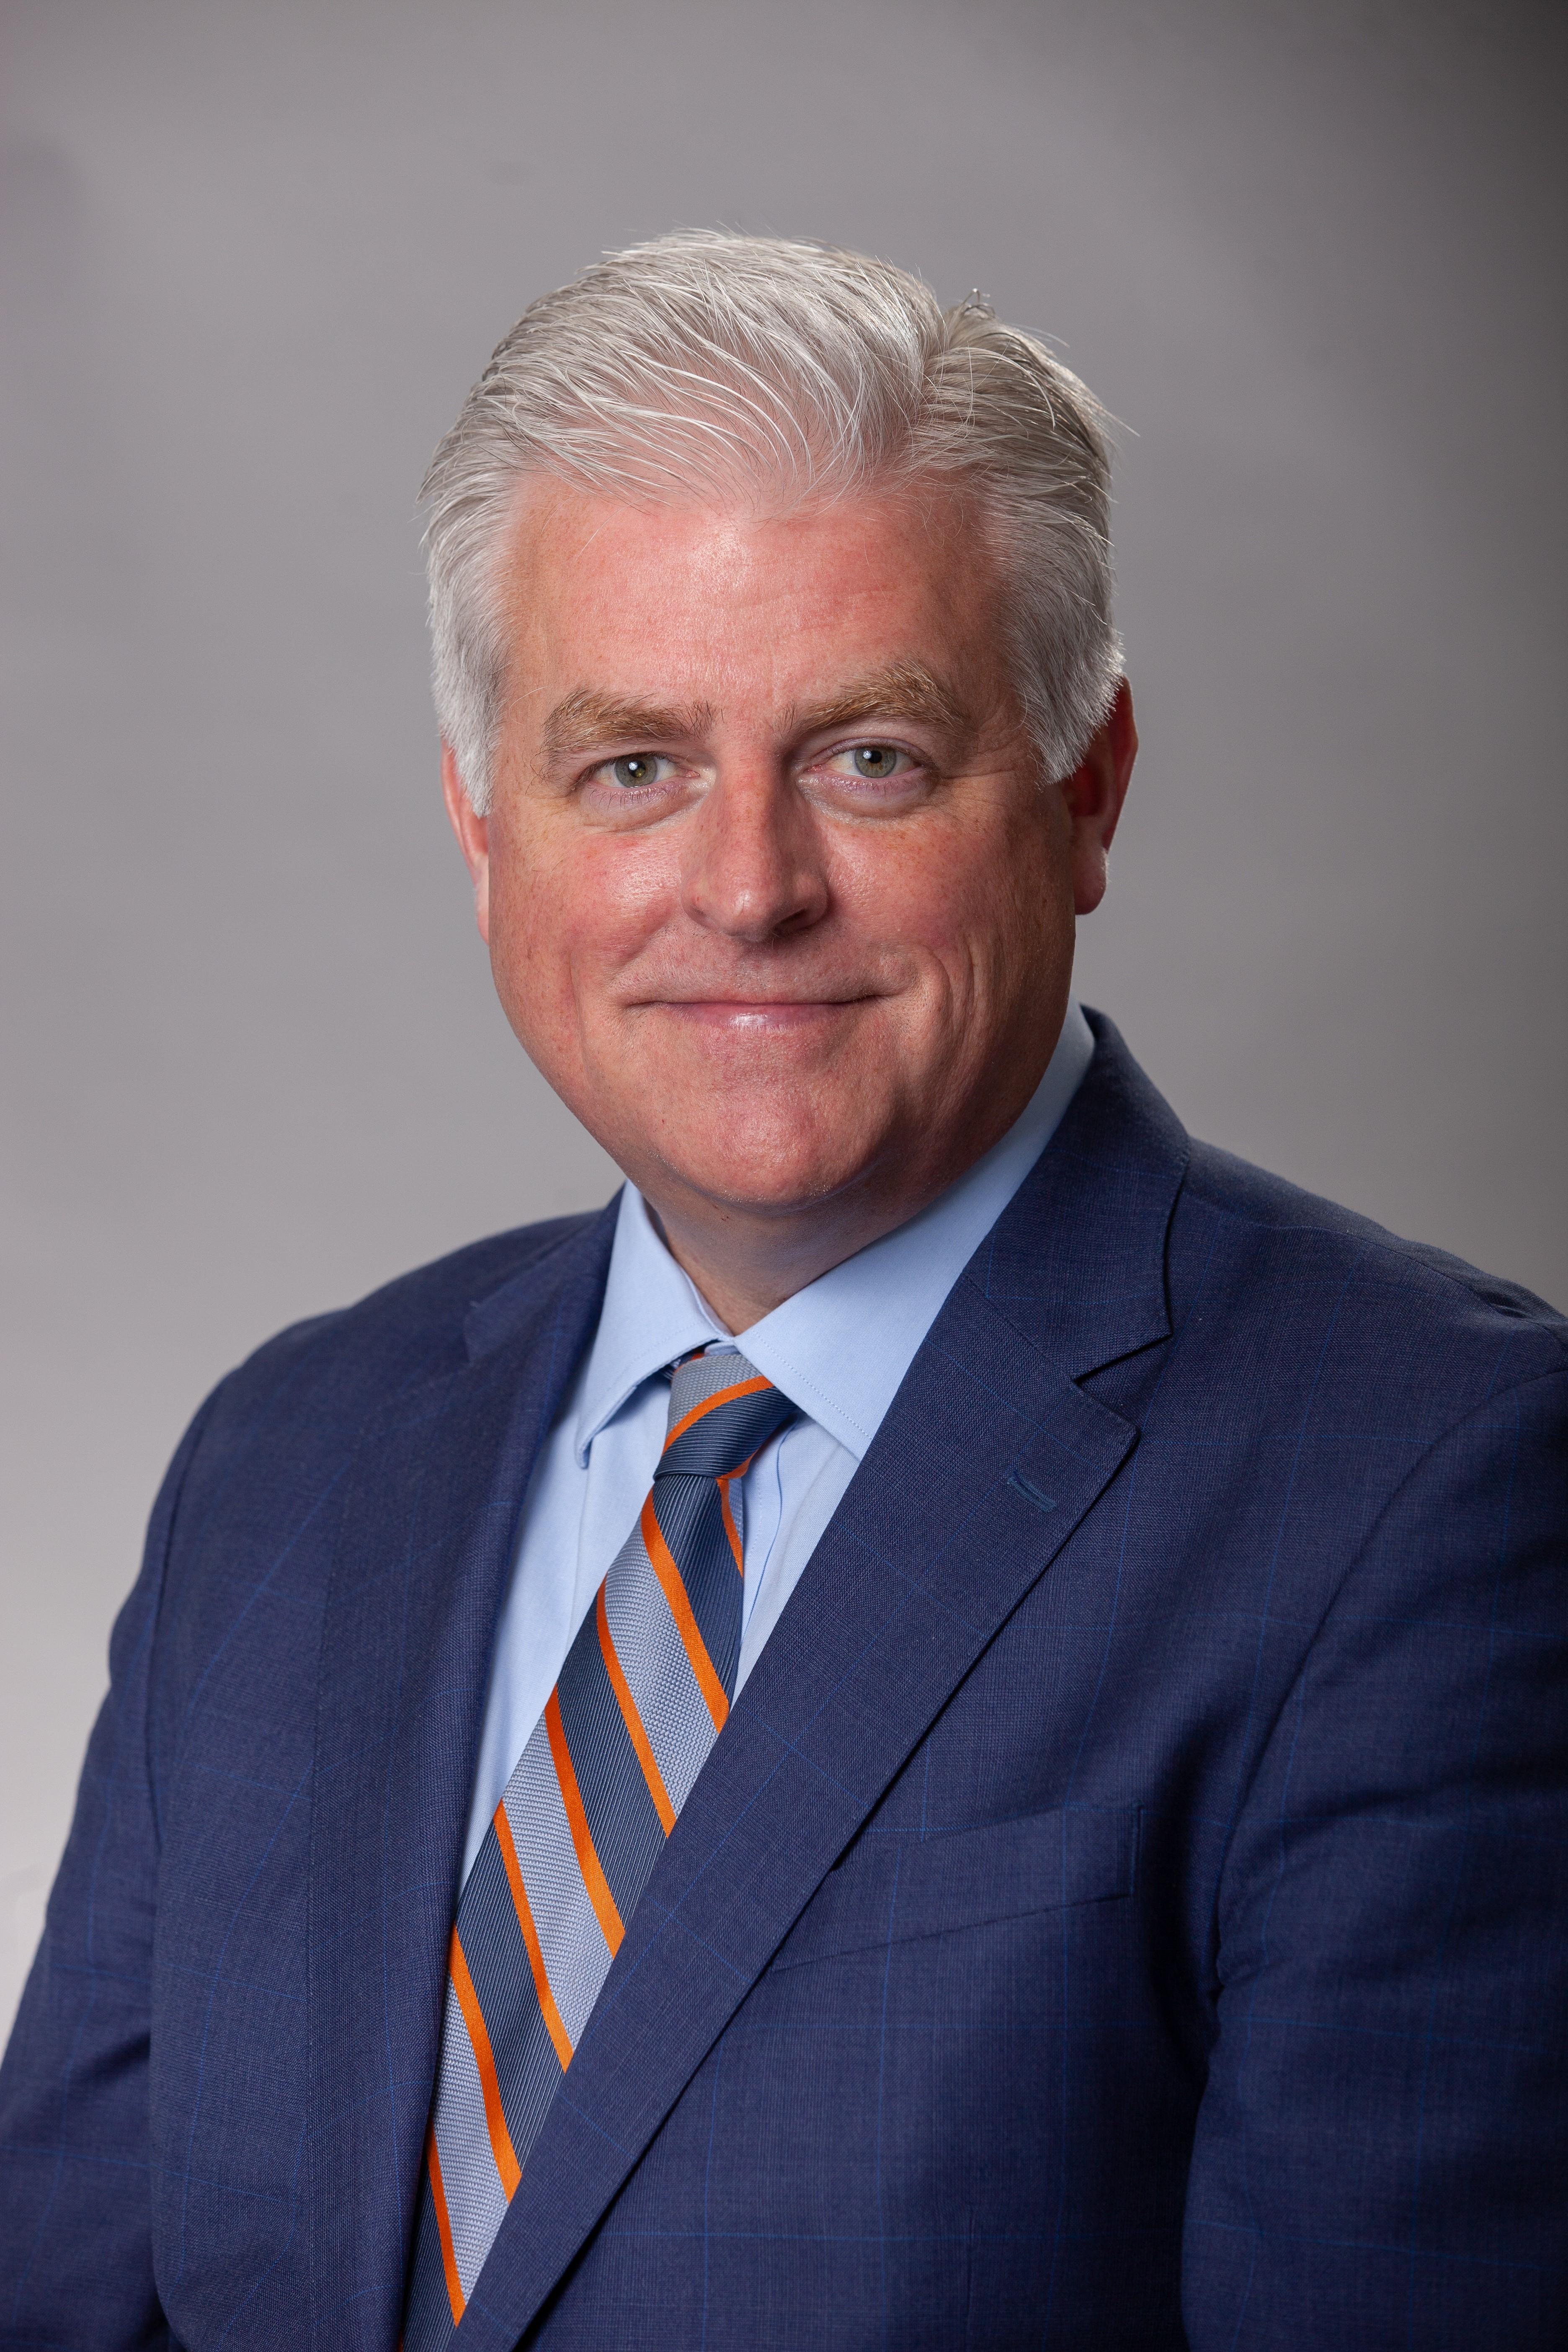 Image of Douglas P. Mahoney